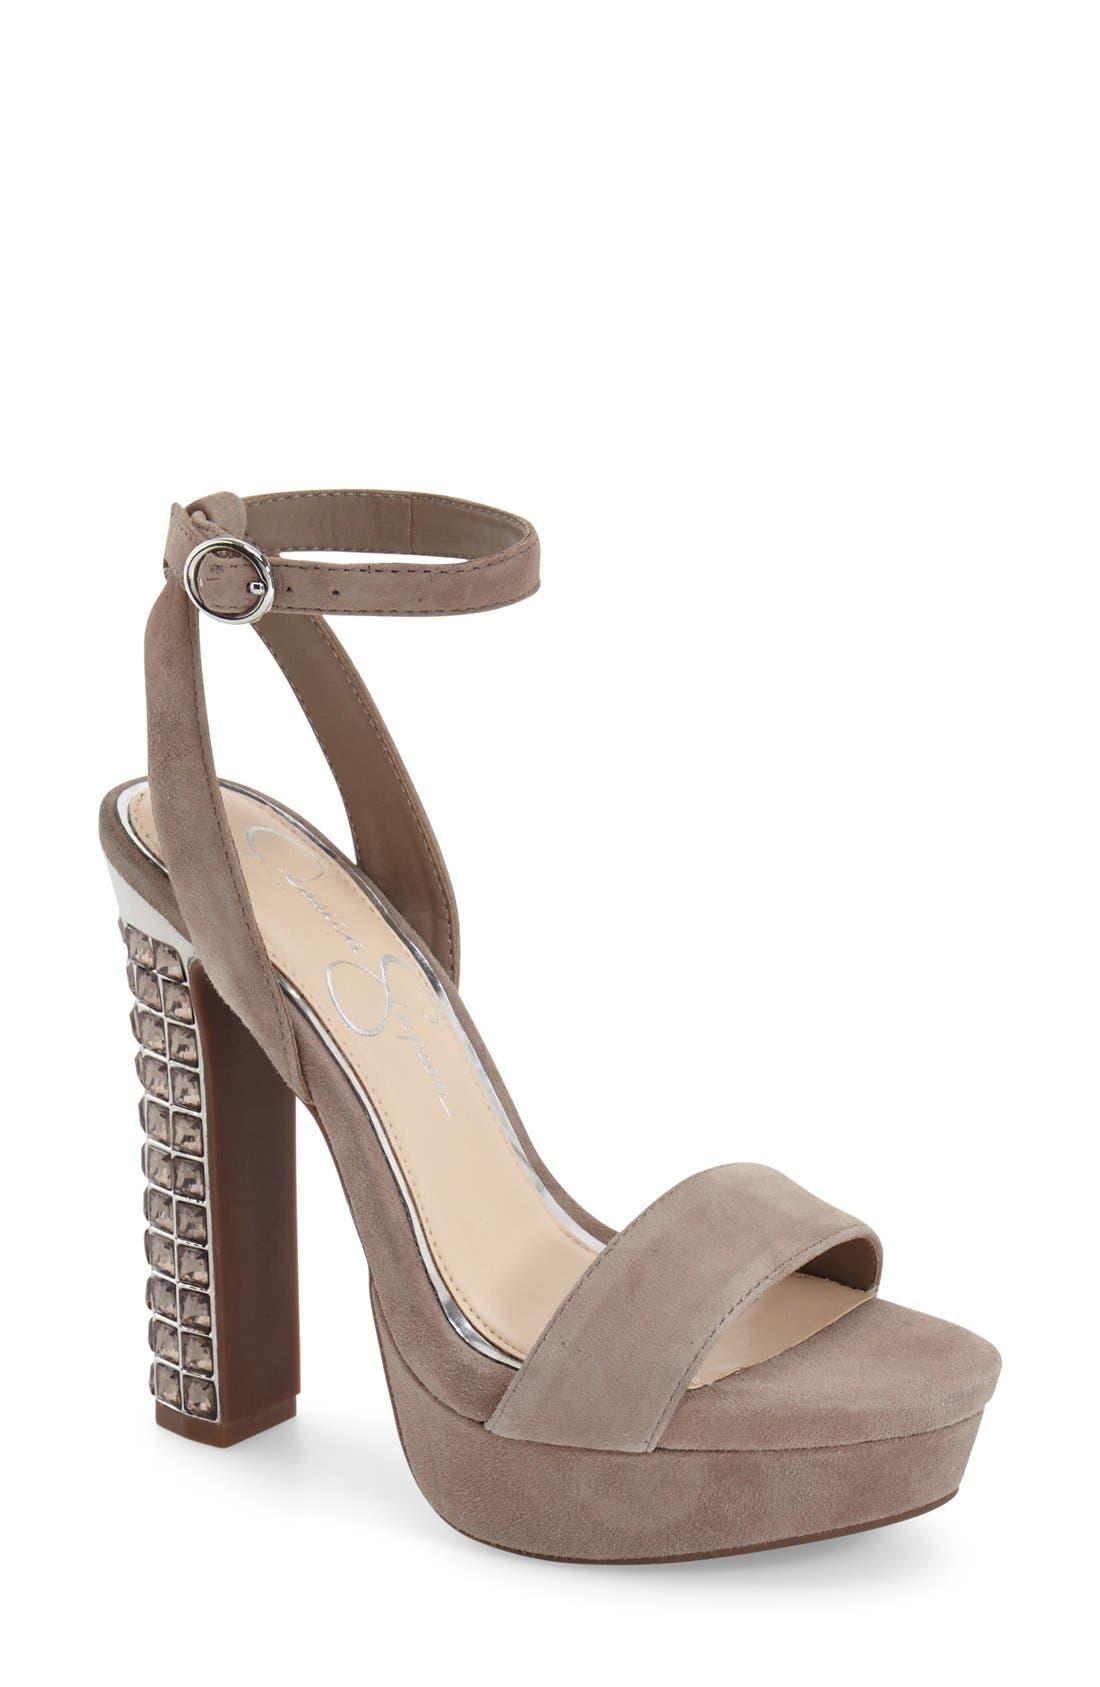 Main Image - Jessica Simpson 'Banda' Embellished Platform Sandal (Women)